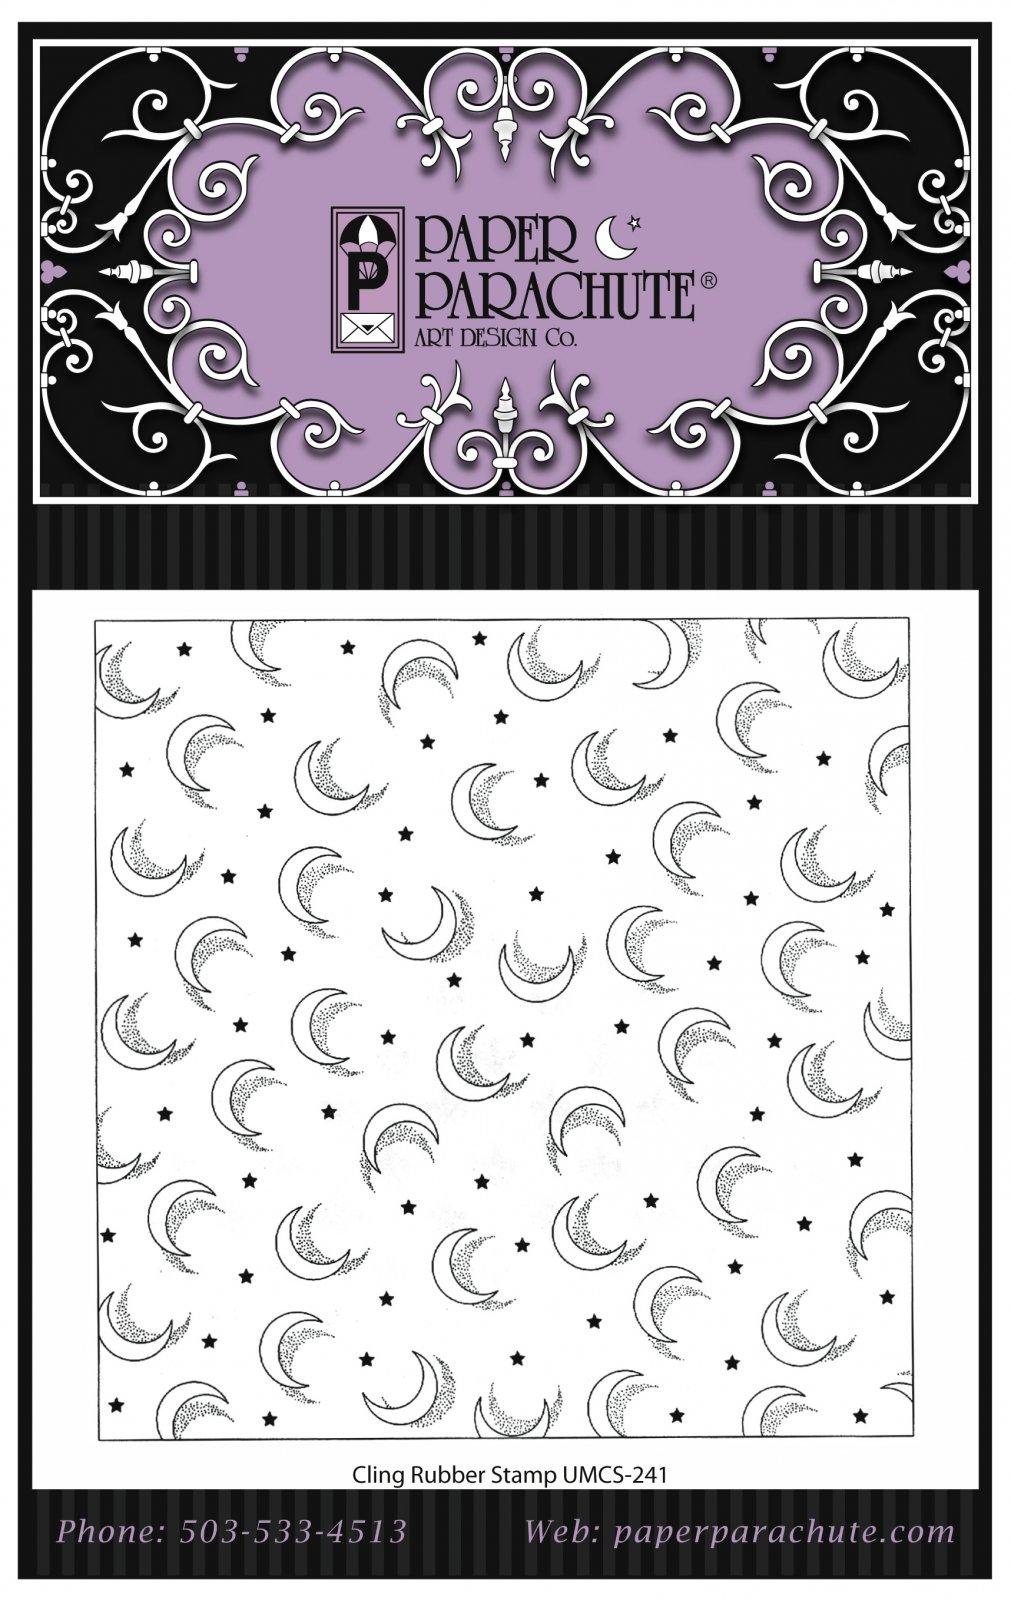 Paper Parachute Rubber Stamp - UMCS241